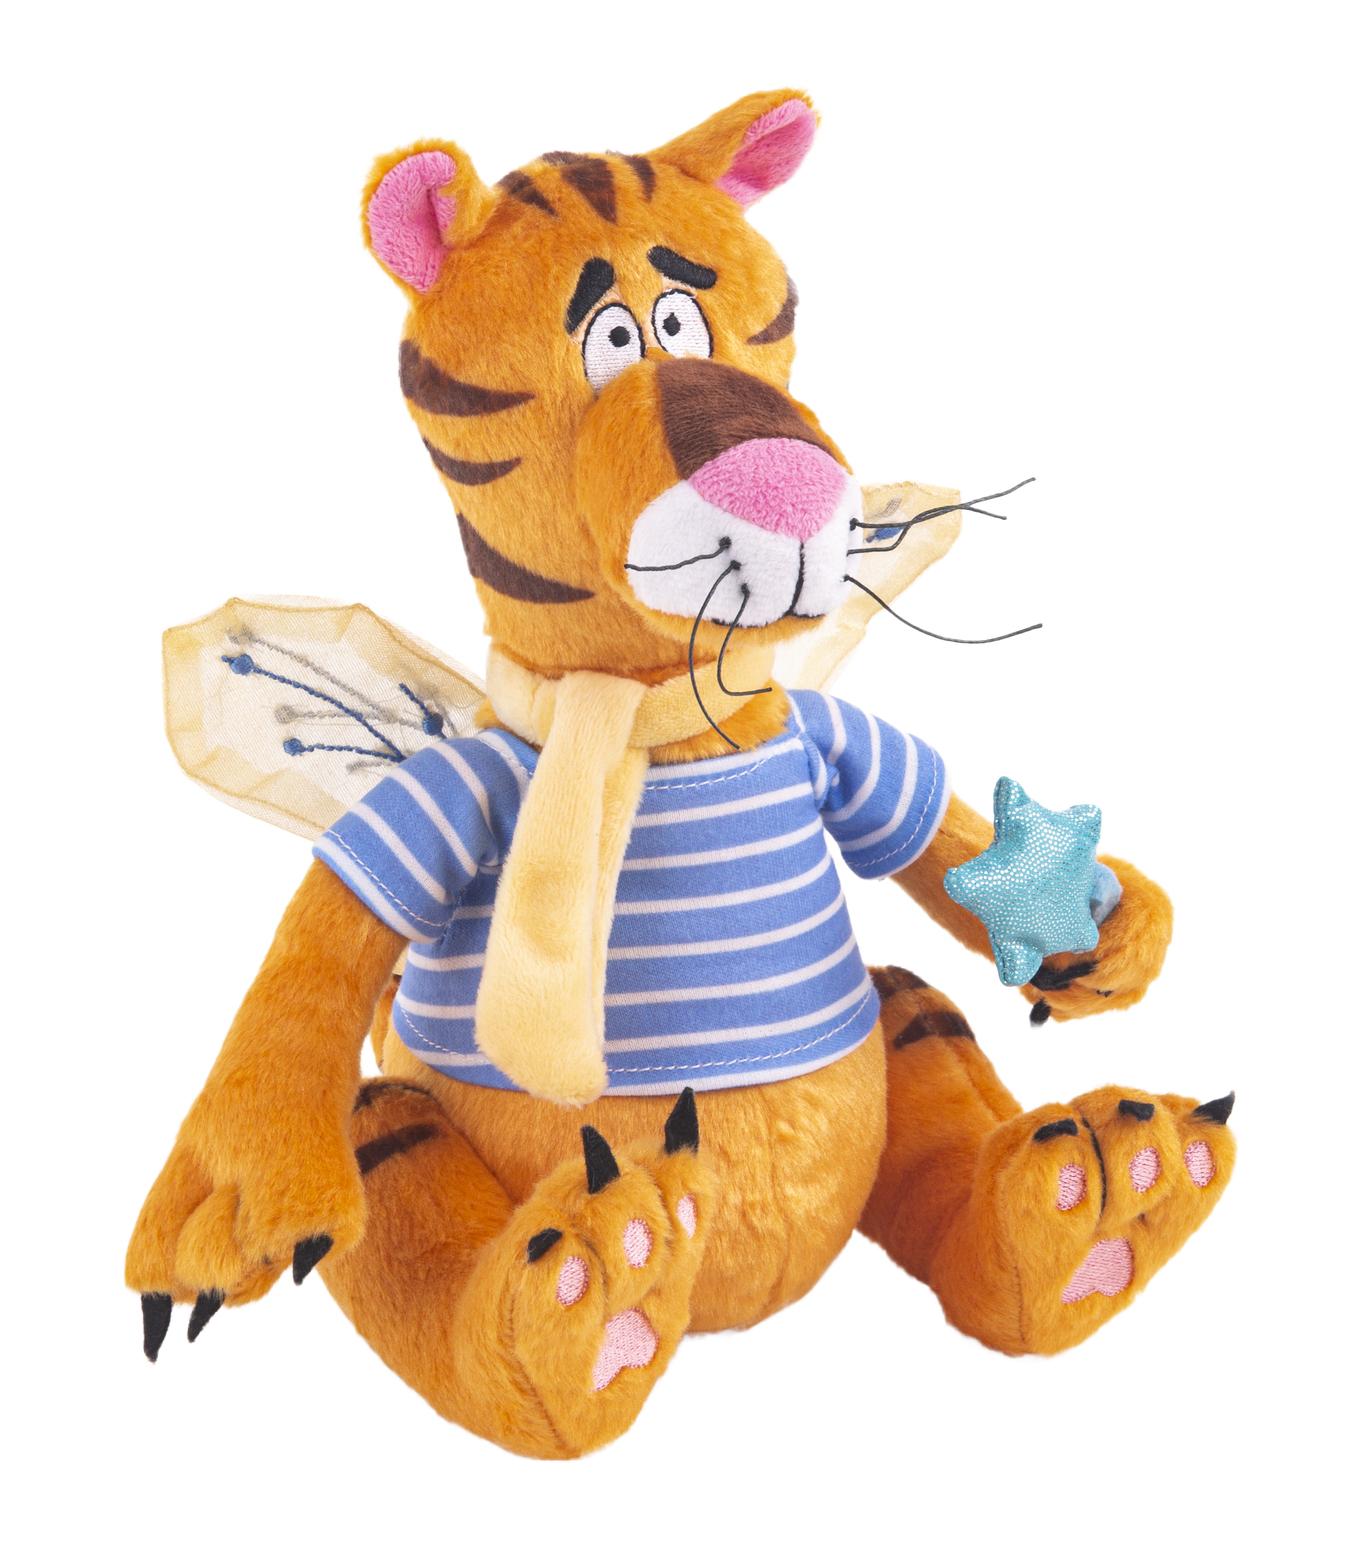 Gulliver Тигро-Фей мягкая игрушка, 20 см